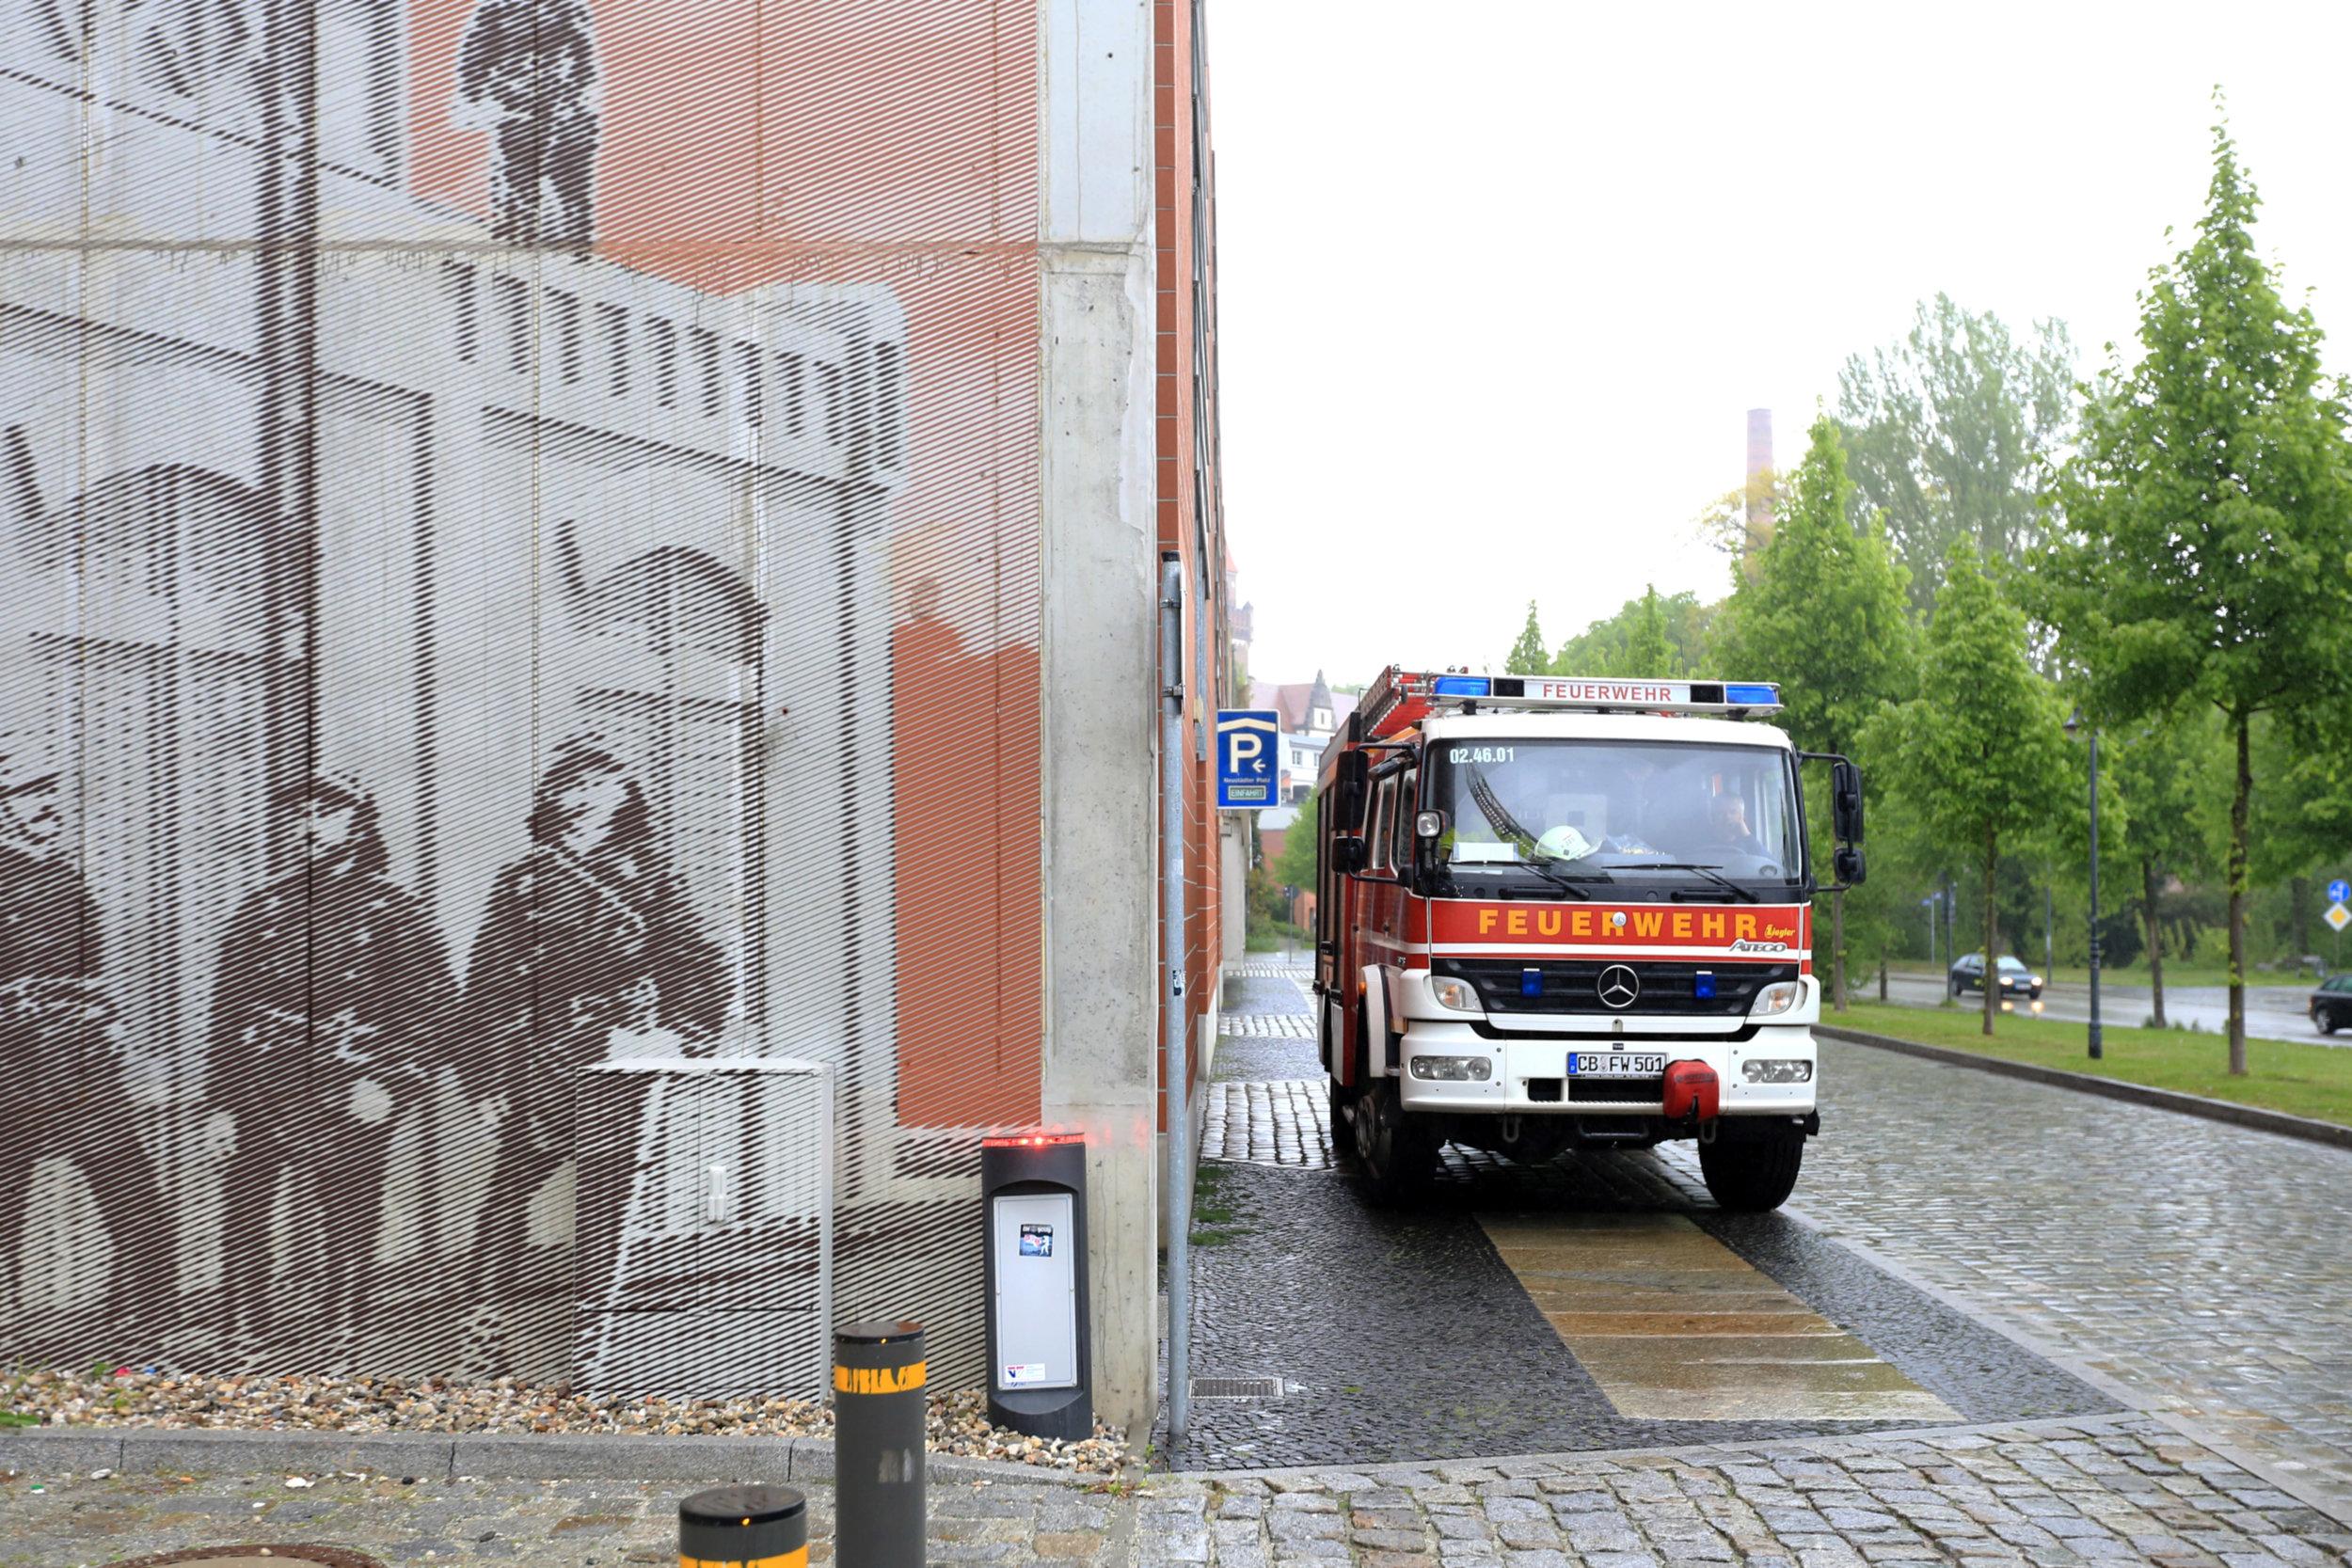 Feuerwehr_Wandbild_Fassadenmalerei_Parkhaus_Rasterbild